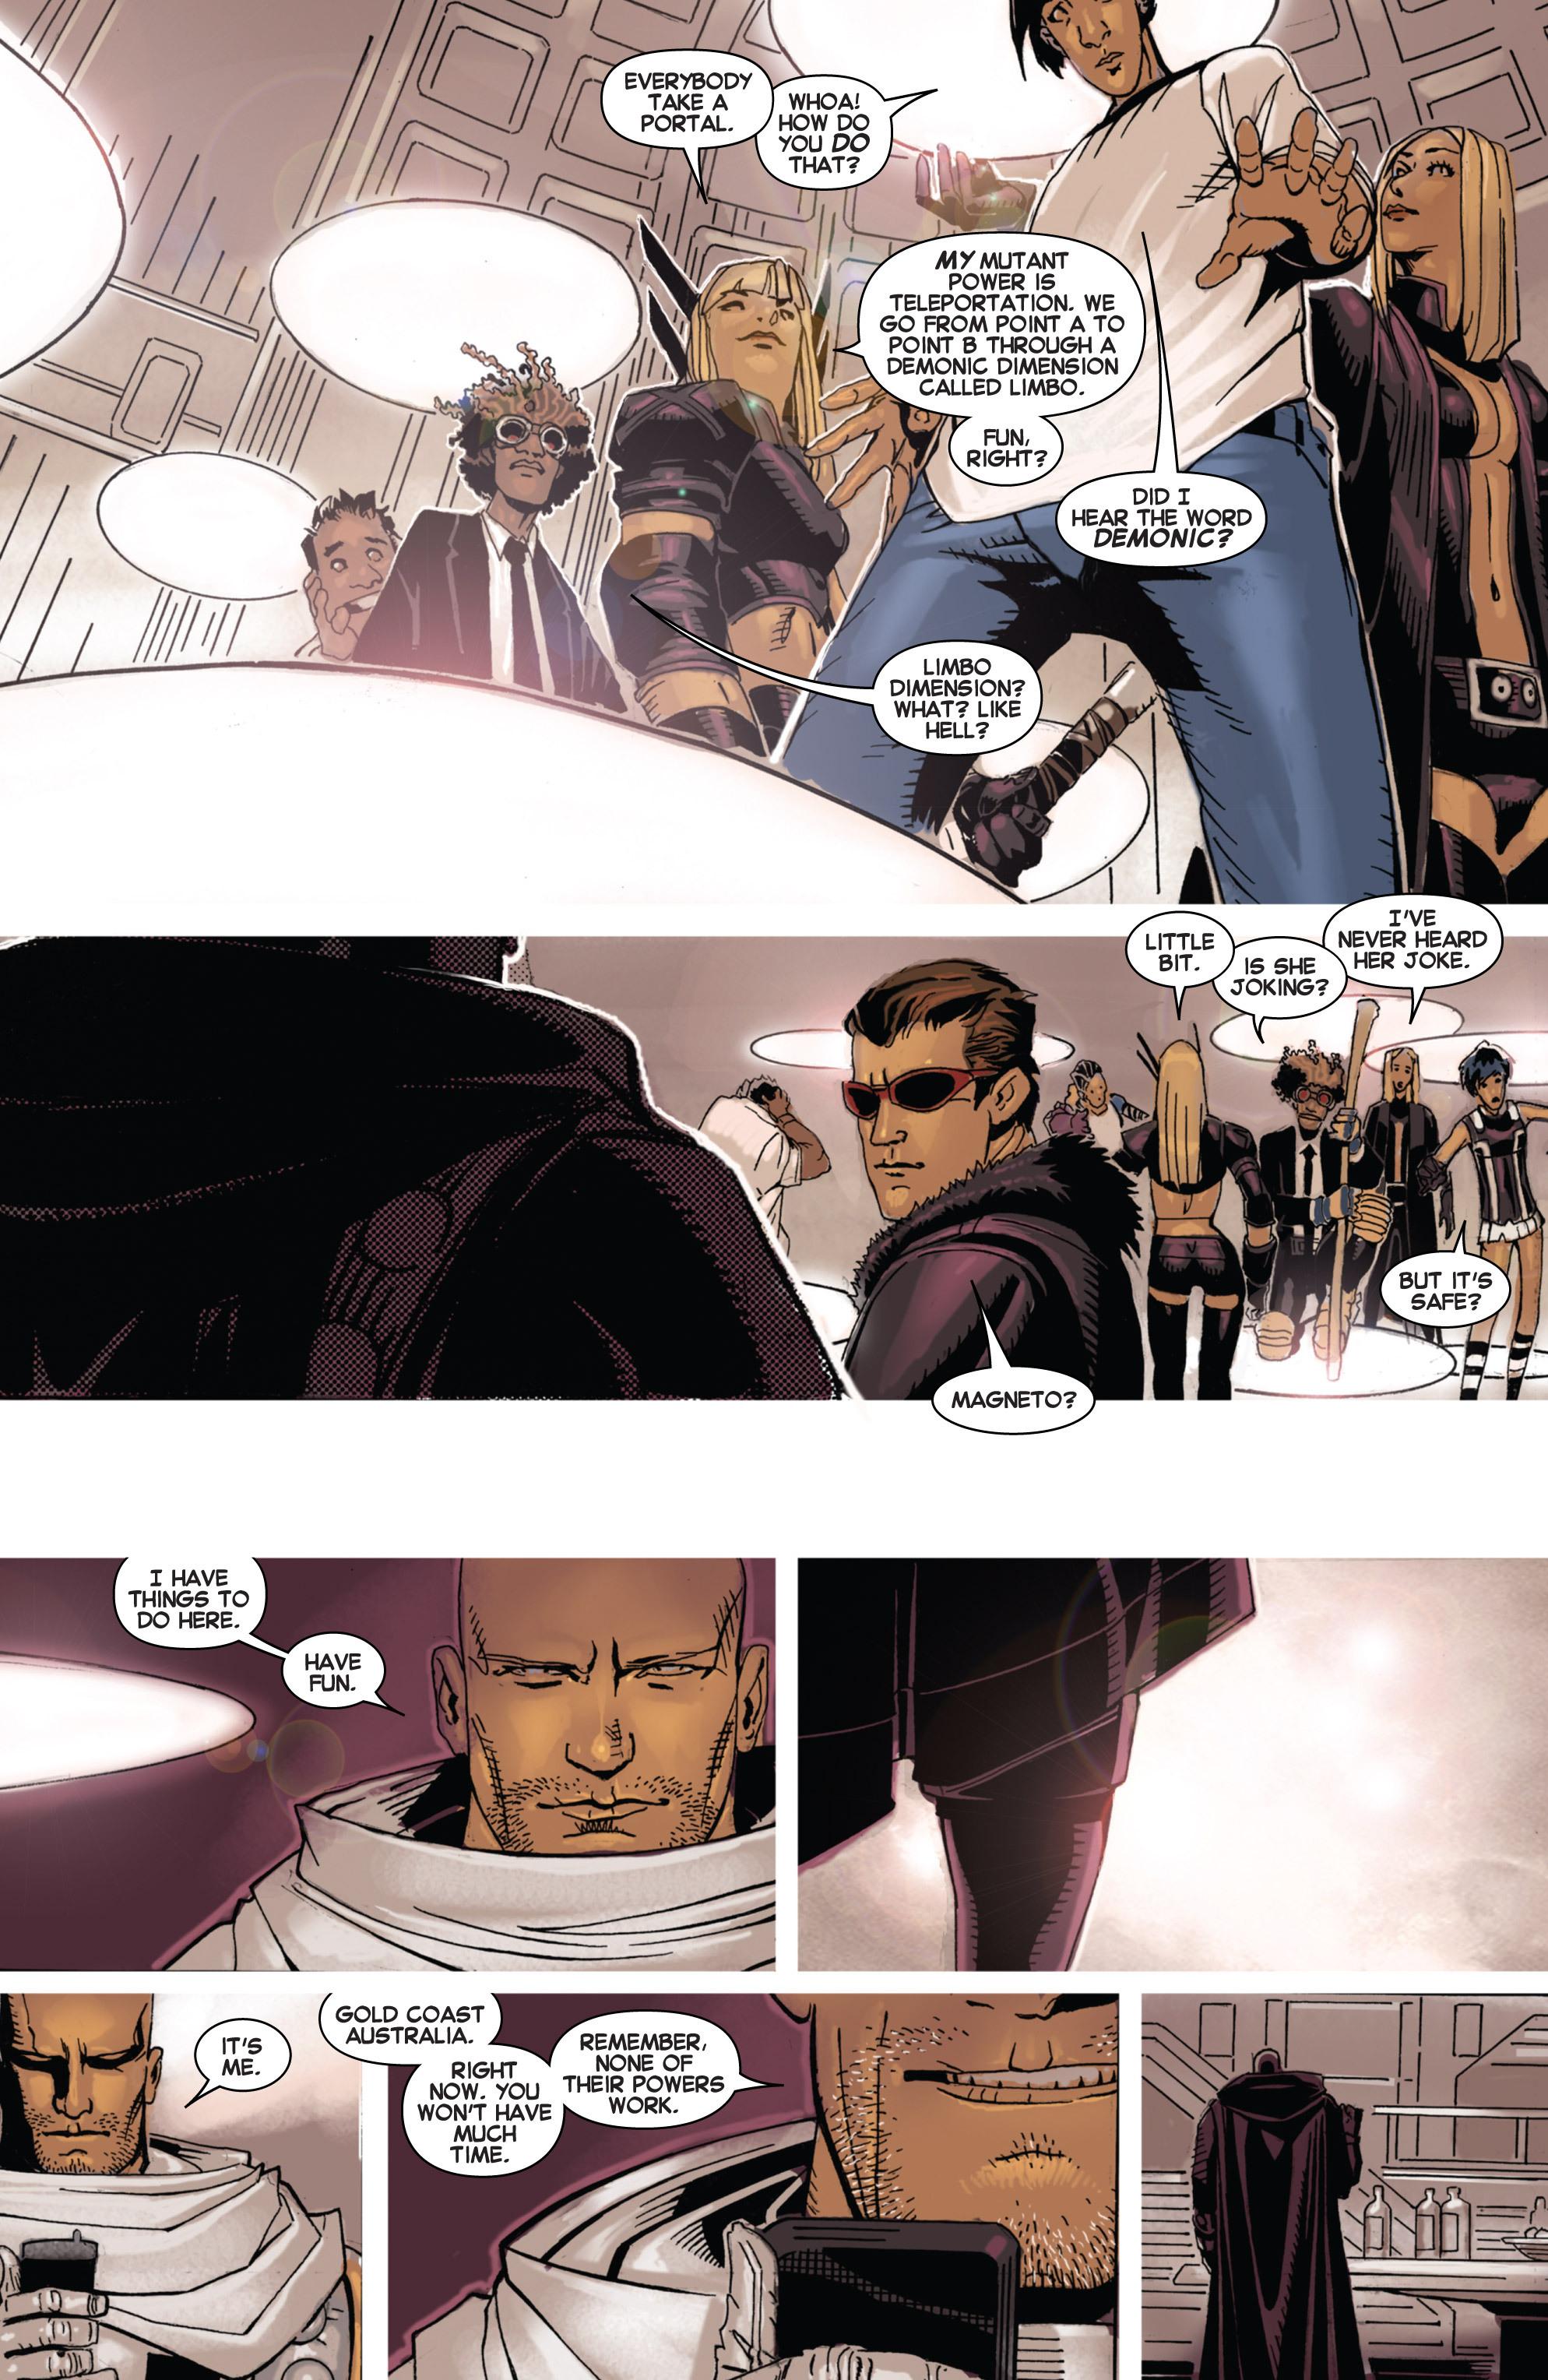 Read online Uncanny X-Men (2013) comic -  Issue # _TPB 1 - Revolution - 40